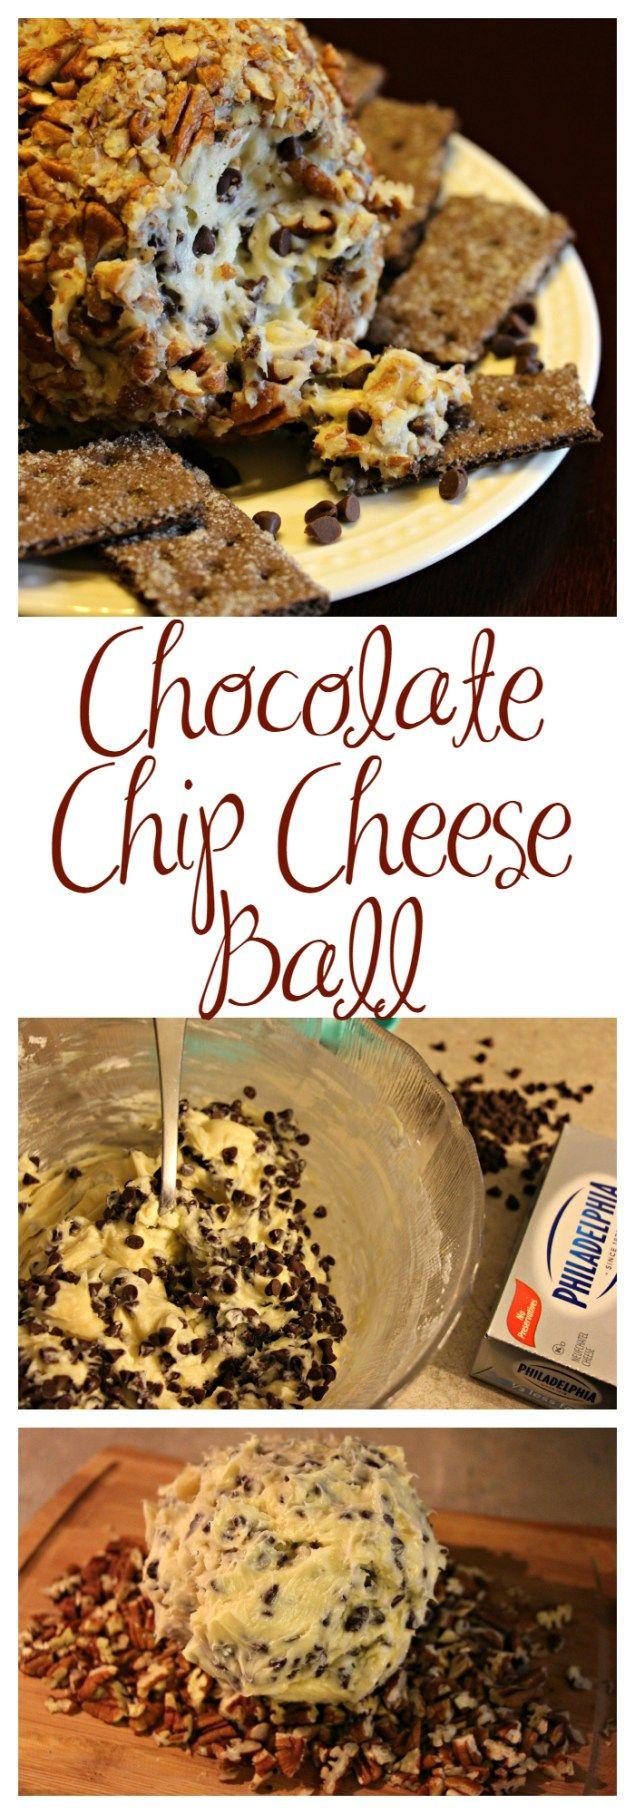 Chocolate Chip Cheese Ball Fiesta Corn Dip